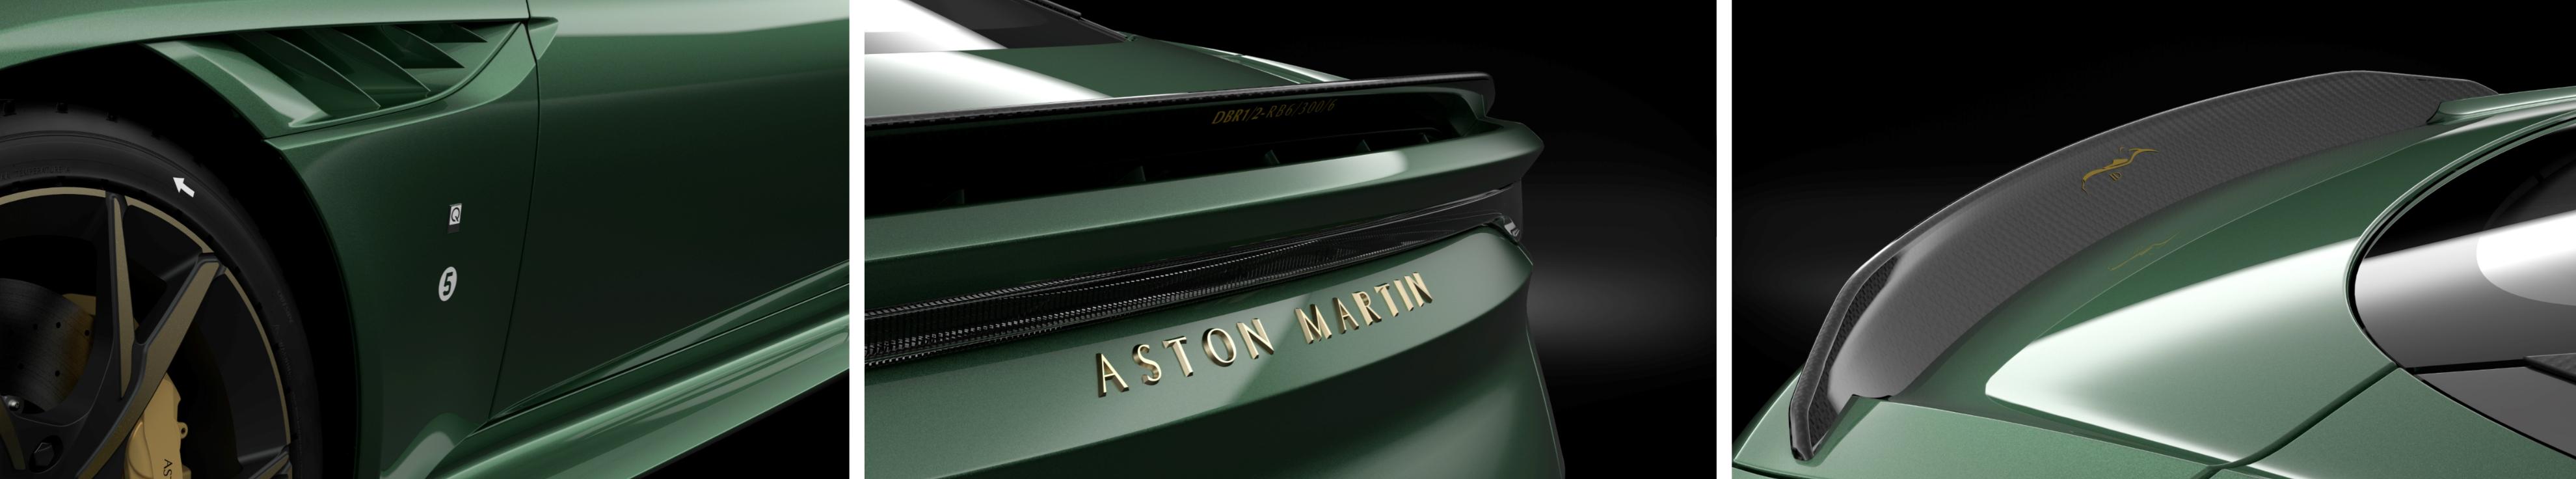 DBS 59 Aston Martin